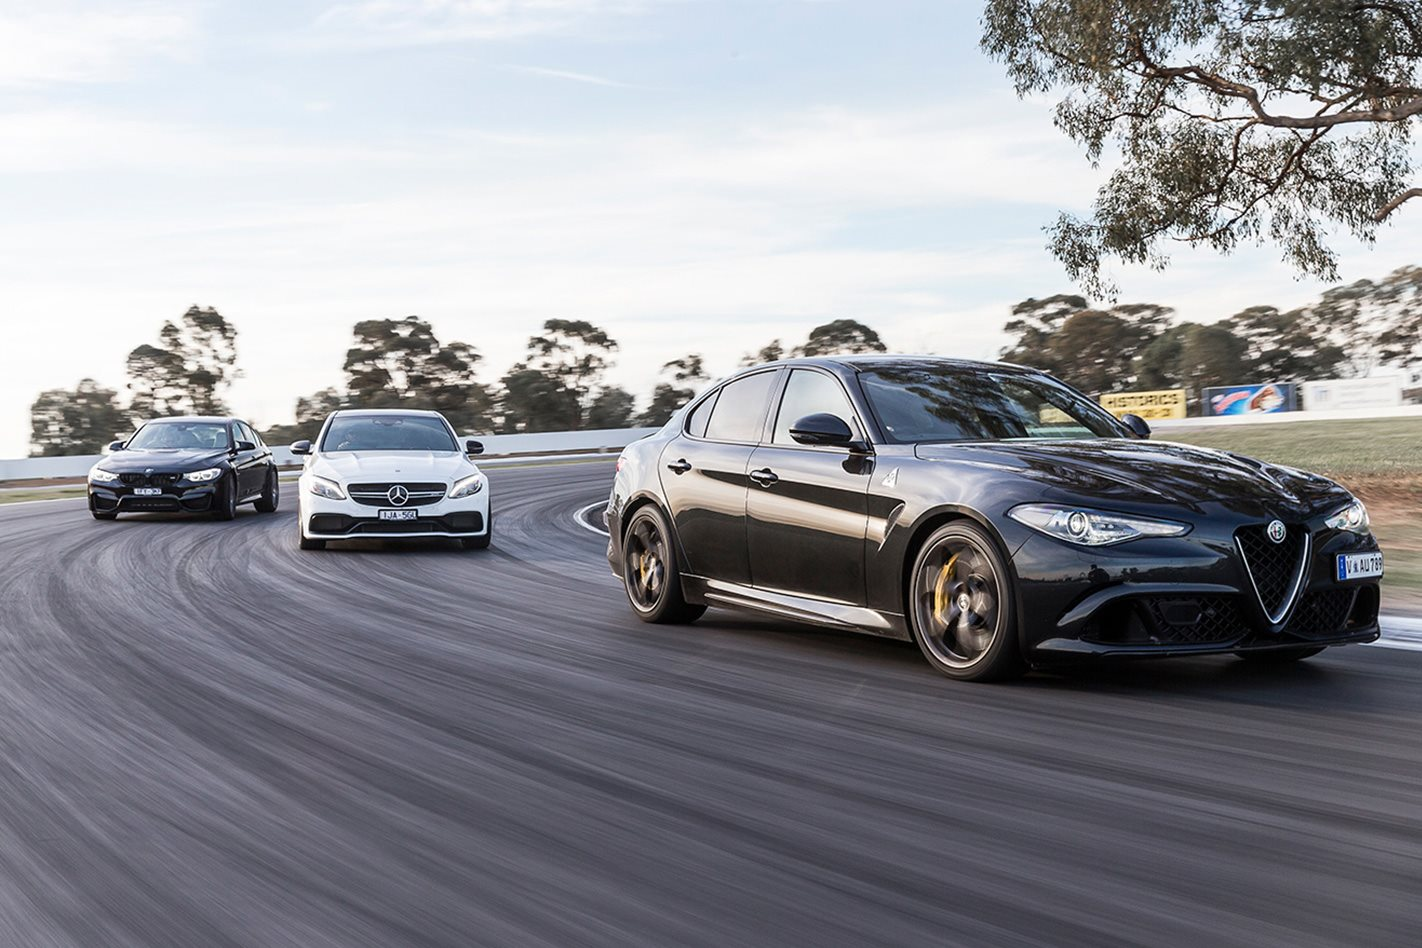 Alfa Giulia QV vs Mercedes AMG C63 vs BMW M3 Competition